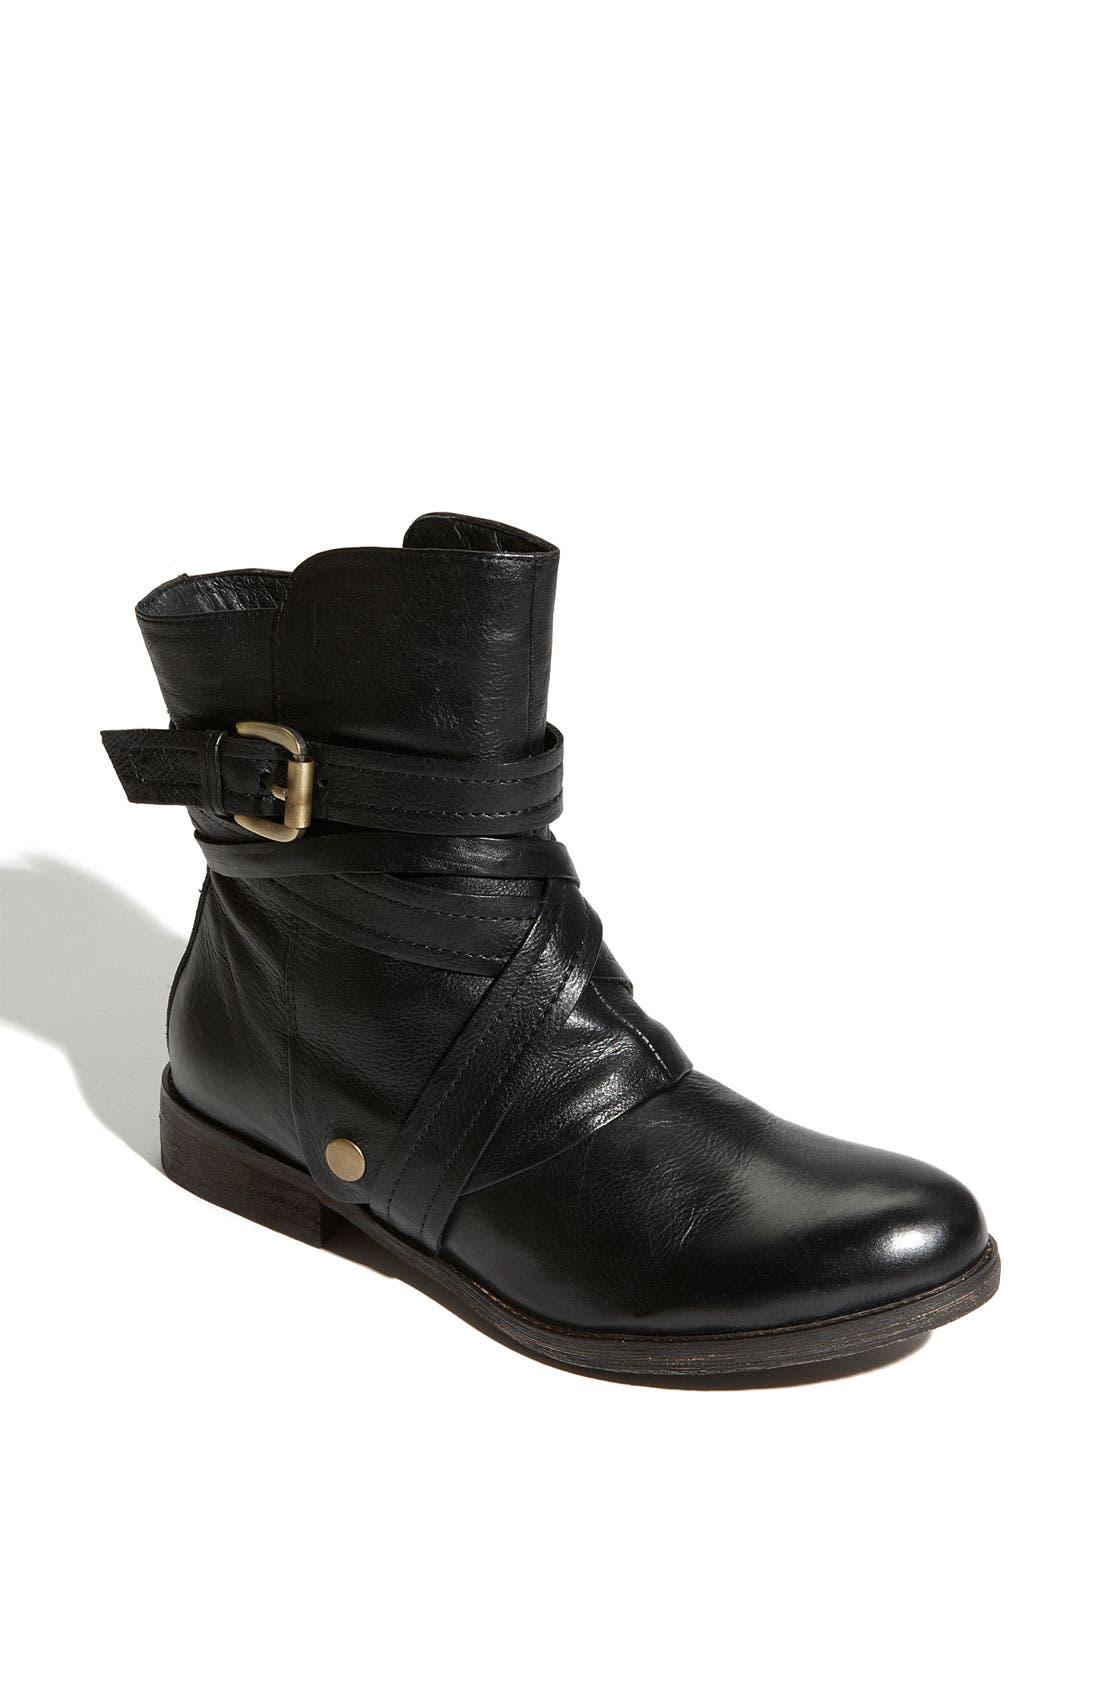 Alternate Image 1 Selected - Miz Mooz 'Bailey' Boot